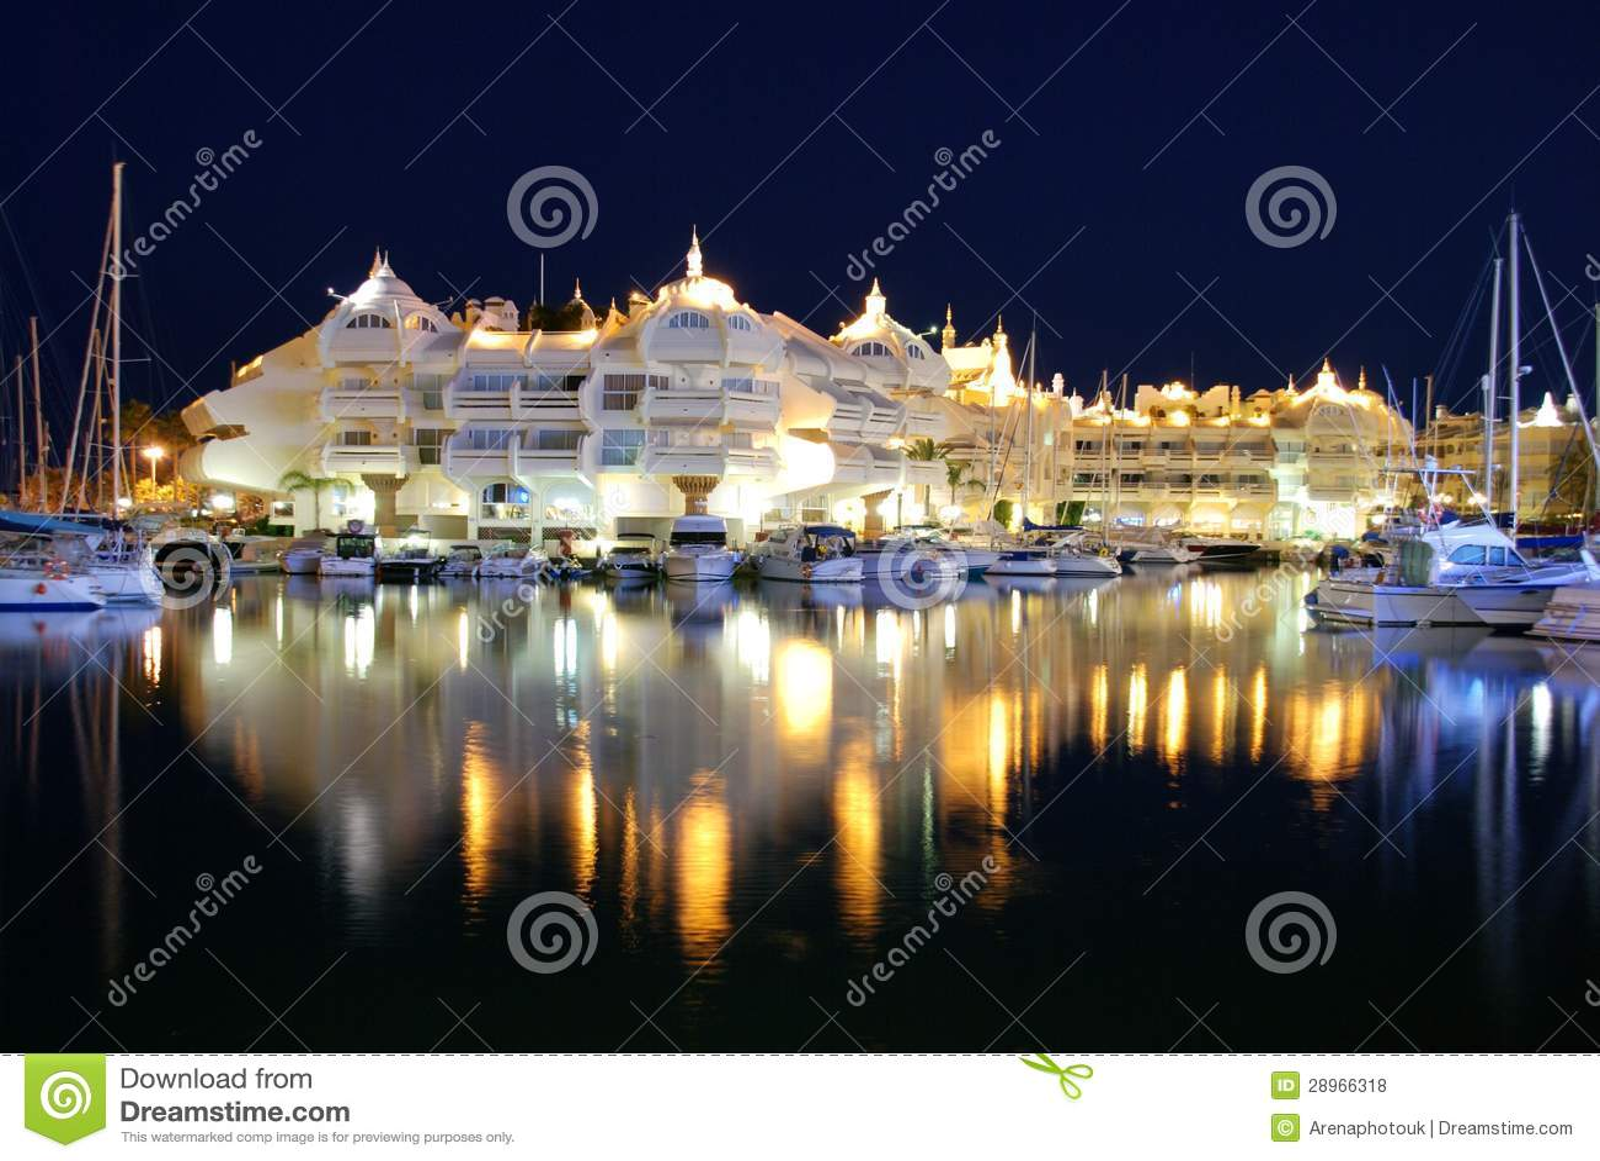 Marina przy nocą, Benalmadena, Andalusia, Hiszpania.